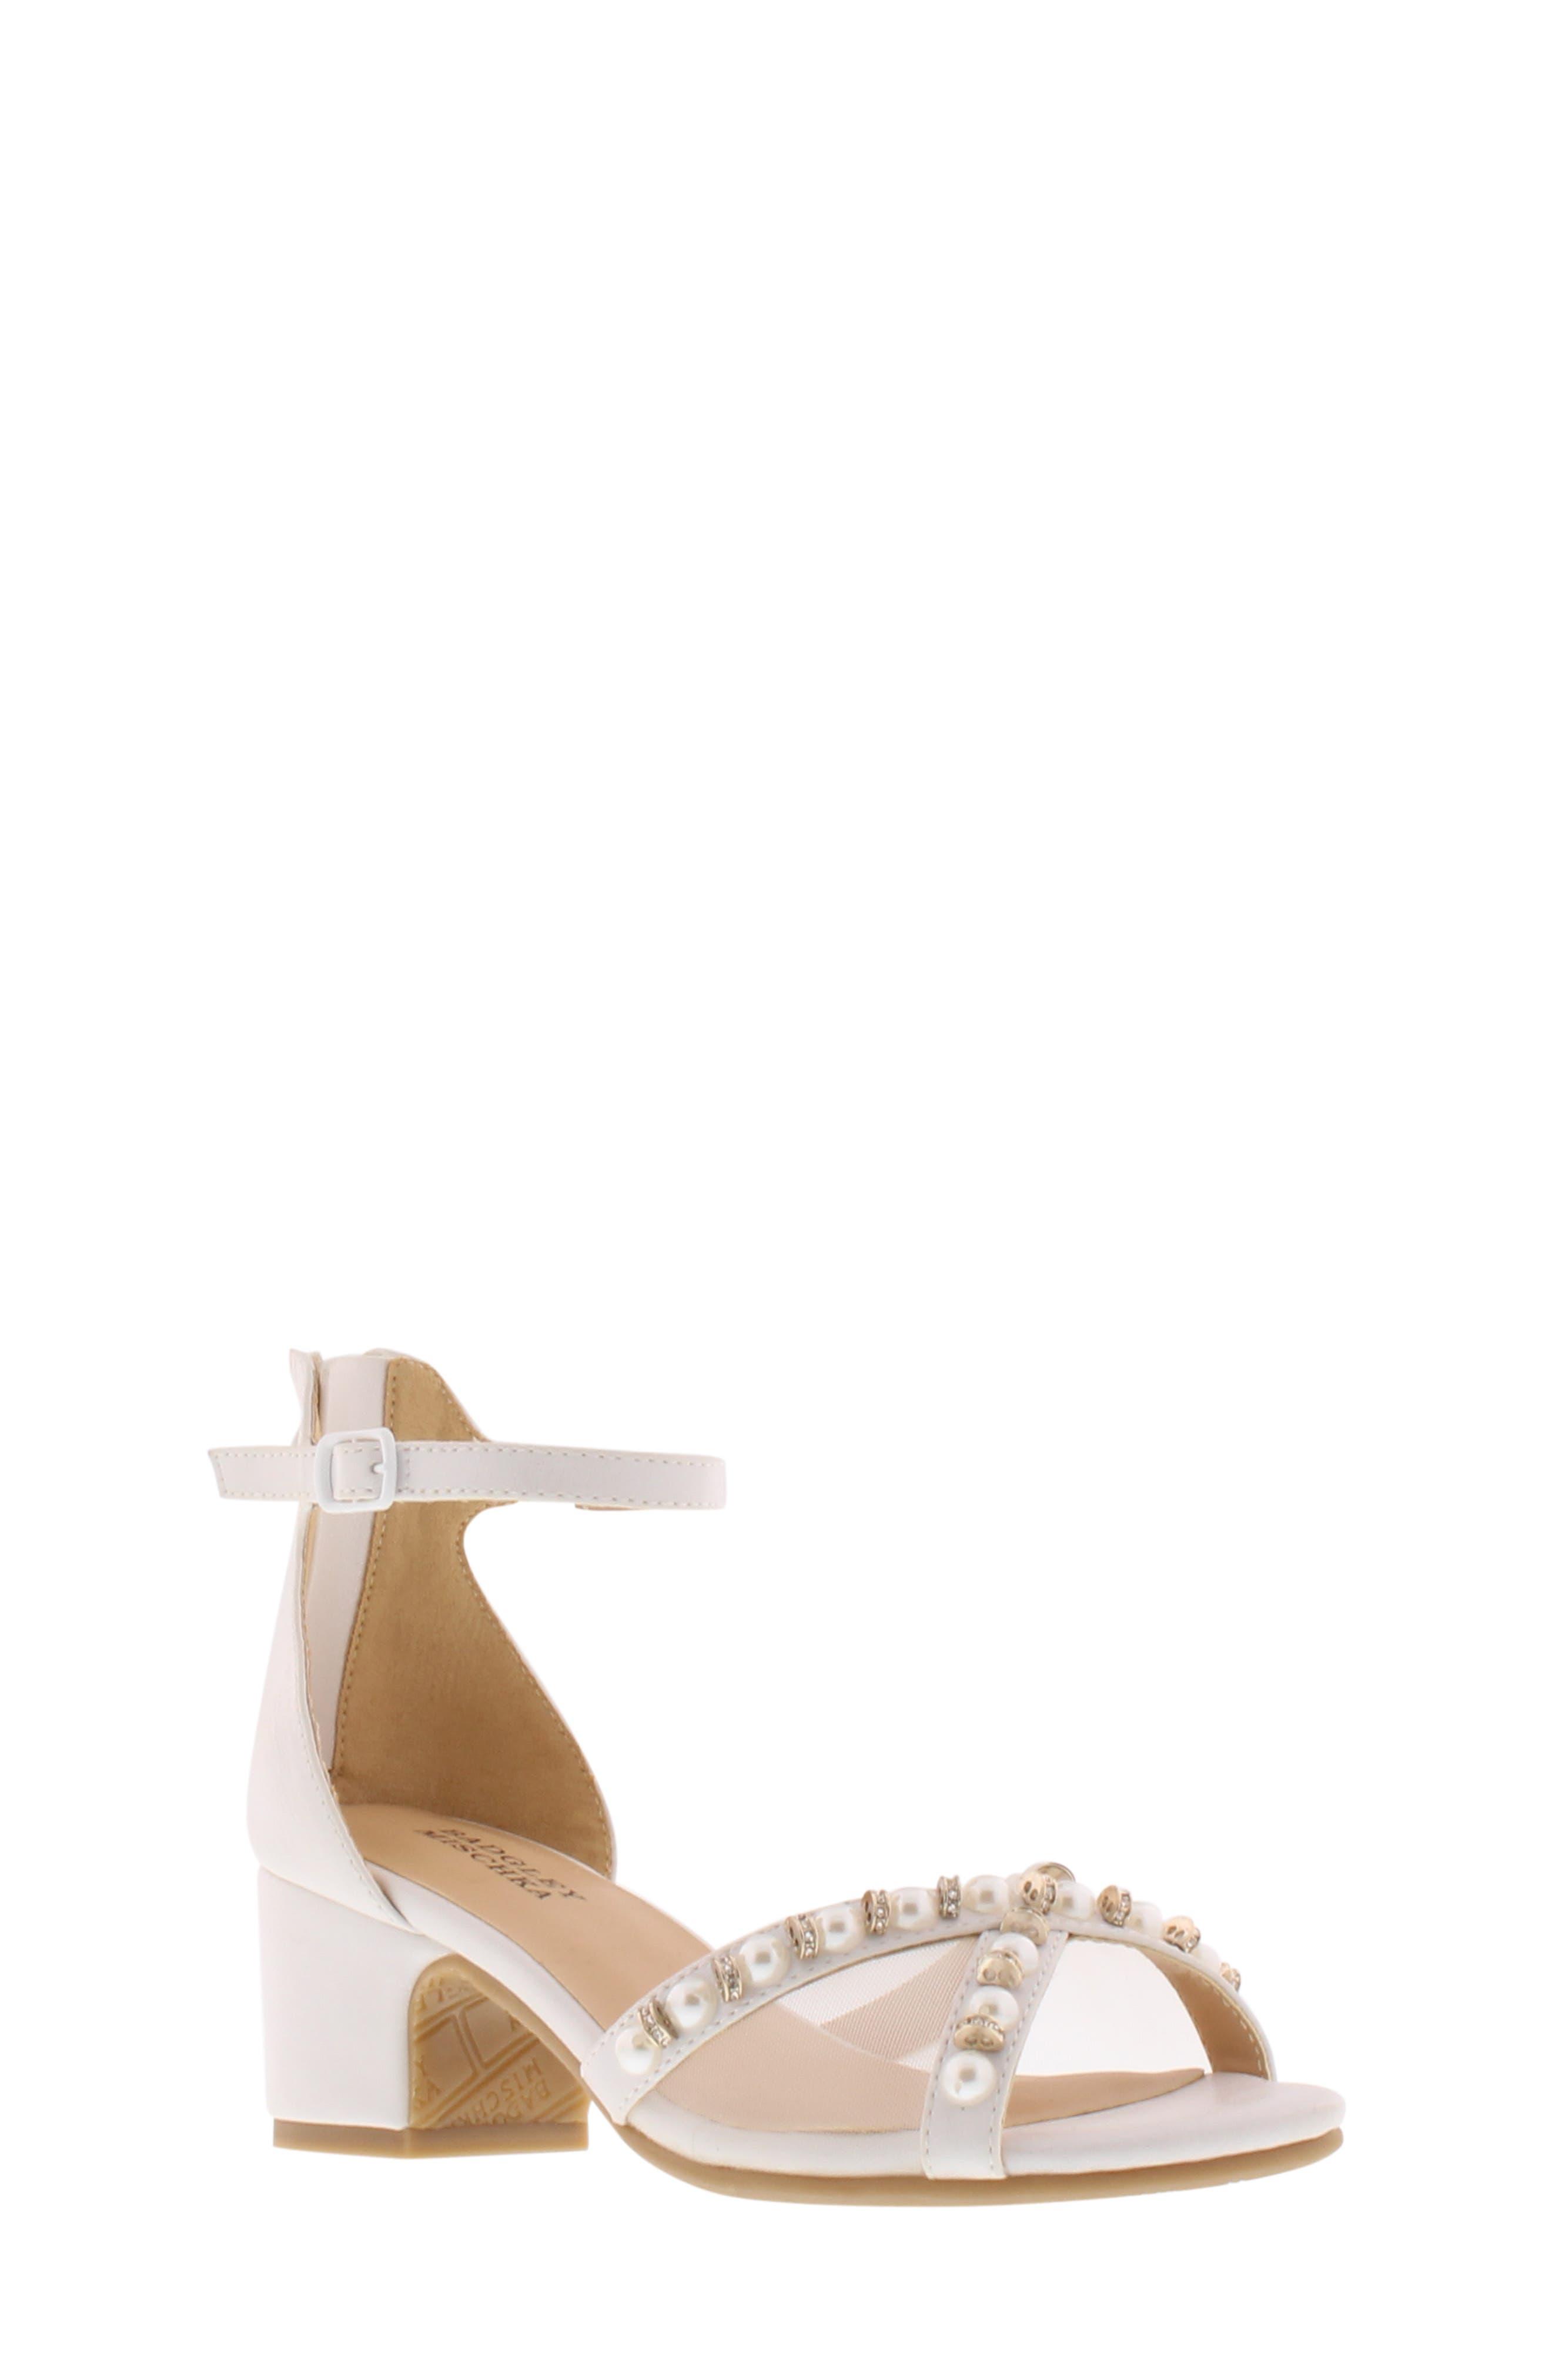 BADGLEY MISCHKA COLLECTION Badgley Mischka Pernia Emily Embellished Sandal, Main, color, WHITE SHIMMER